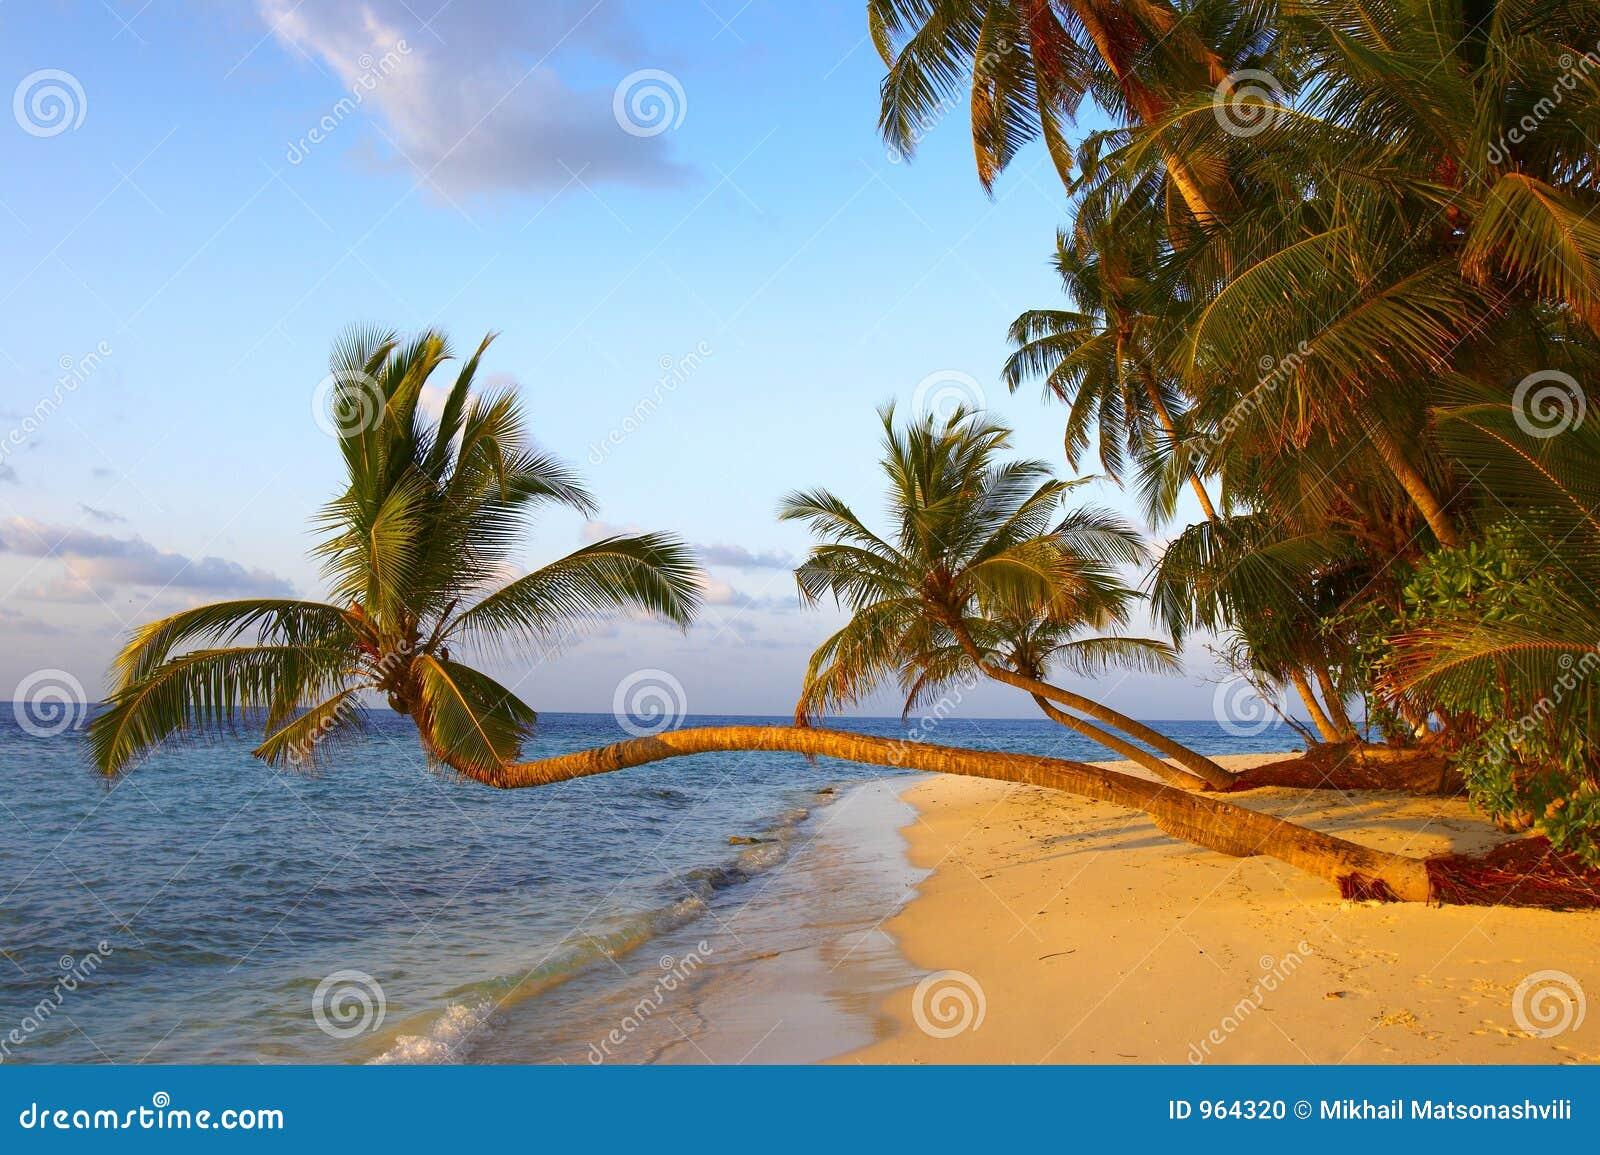 fantastischer sonnenuntergang strand mit palmen stockfoto bild 964320. Black Bedroom Furniture Sets. Home Design Ideas